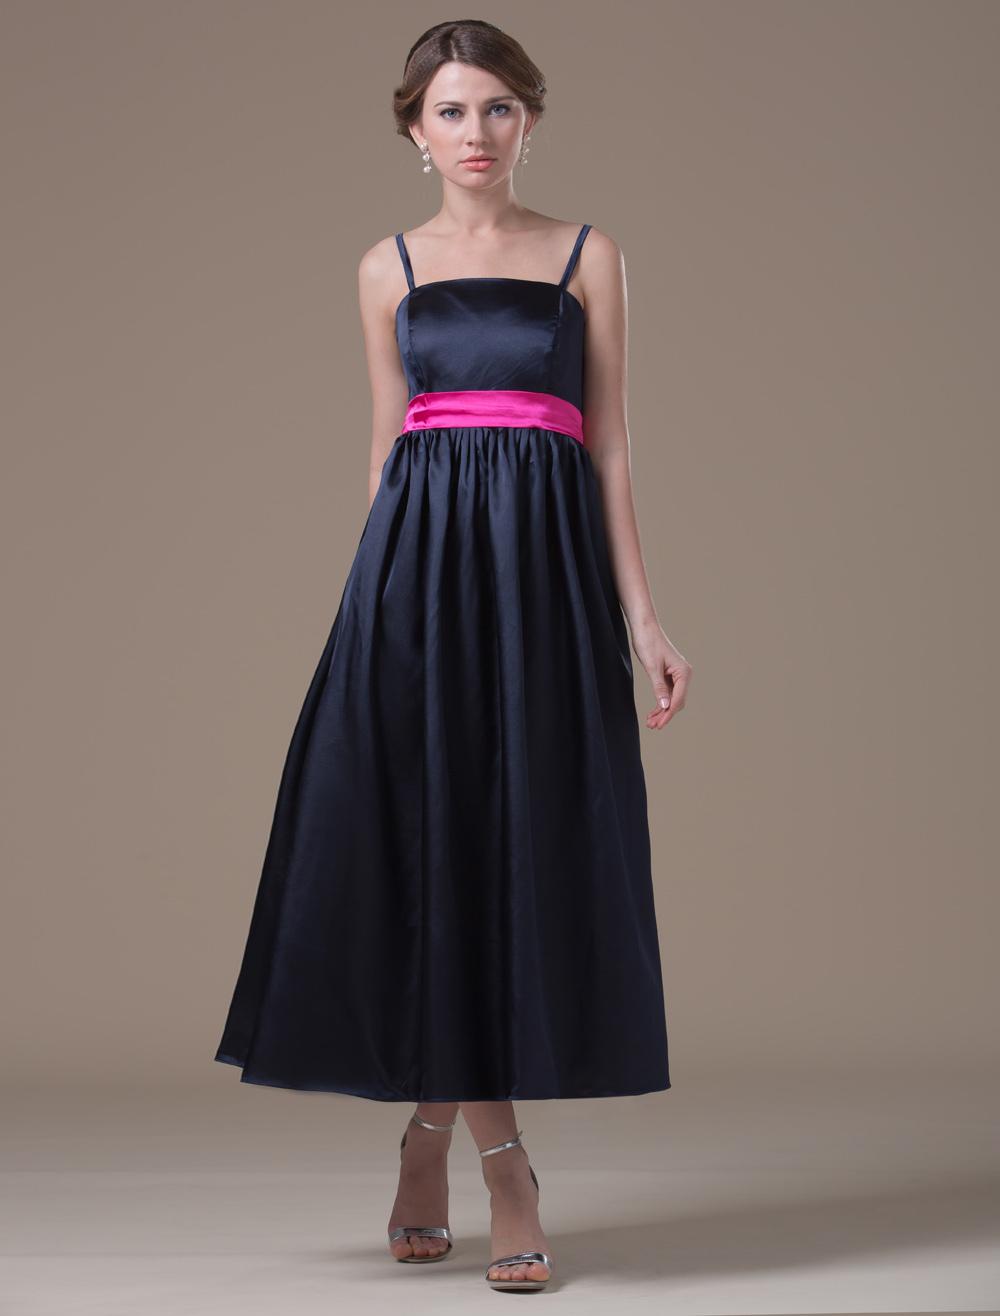 Black A-line Spaghetti Elastic Woven Satin Tea Length Womens Maternity Bridesmaid Dress